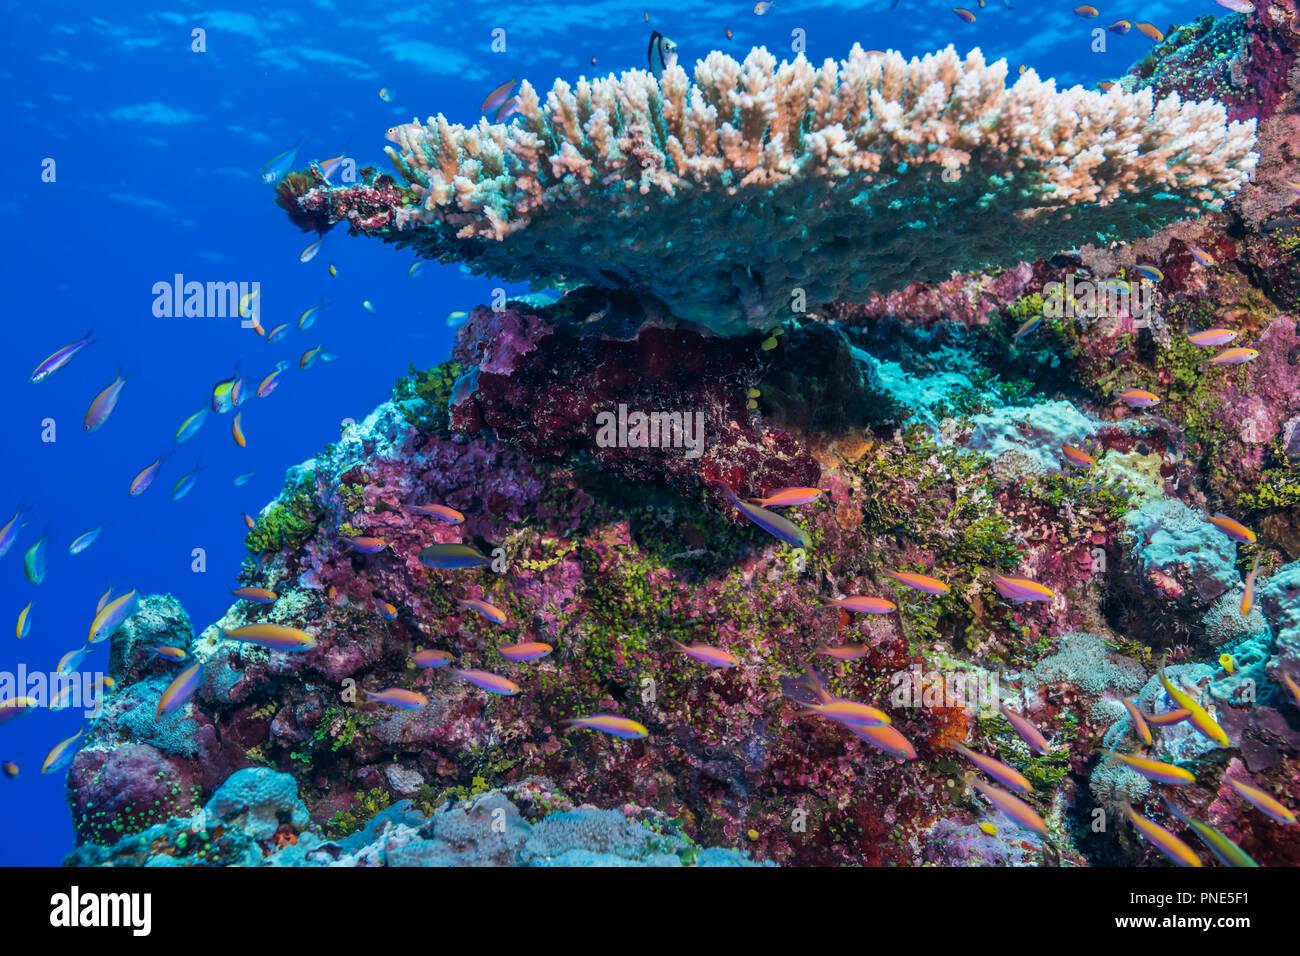 A school of Yellowback anthias (Pseudanthias evansi  (Smith, 1954)) swimming around edge of coral reef. Yap island Federated States of Micronesia Stock Photo